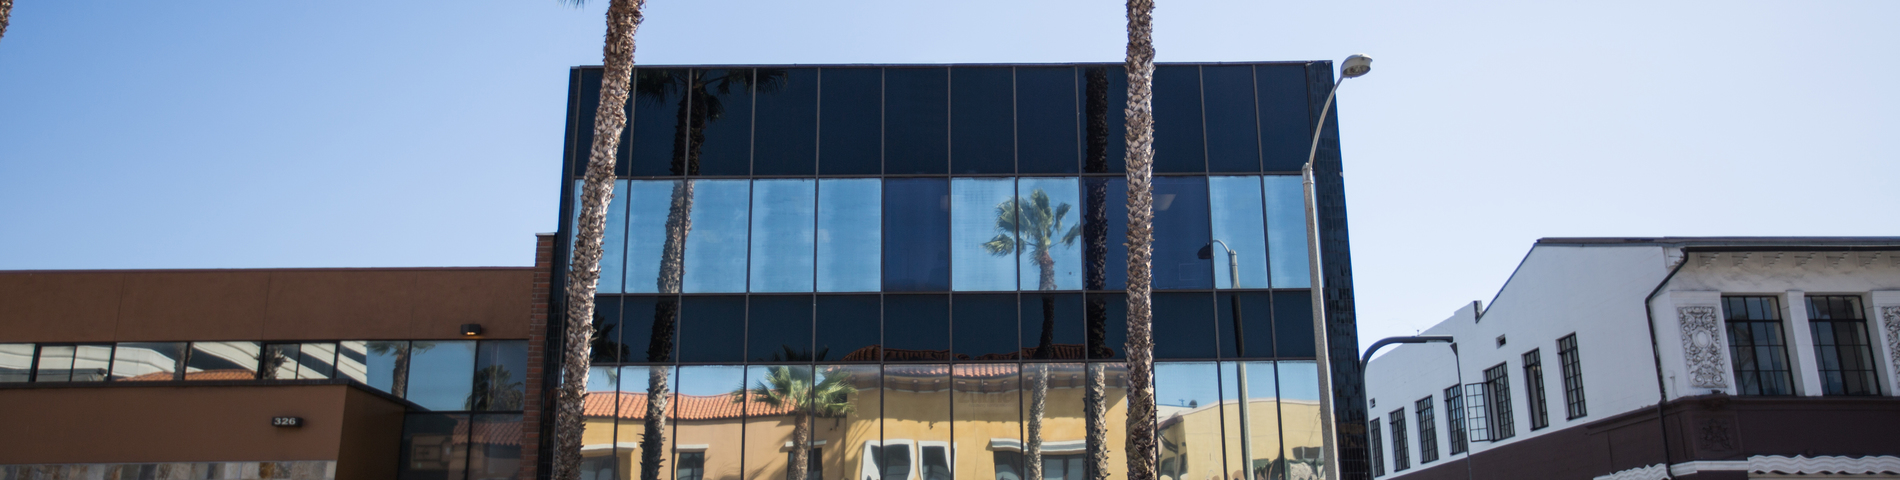 CEL College of English Language Santa Monica зображення 1